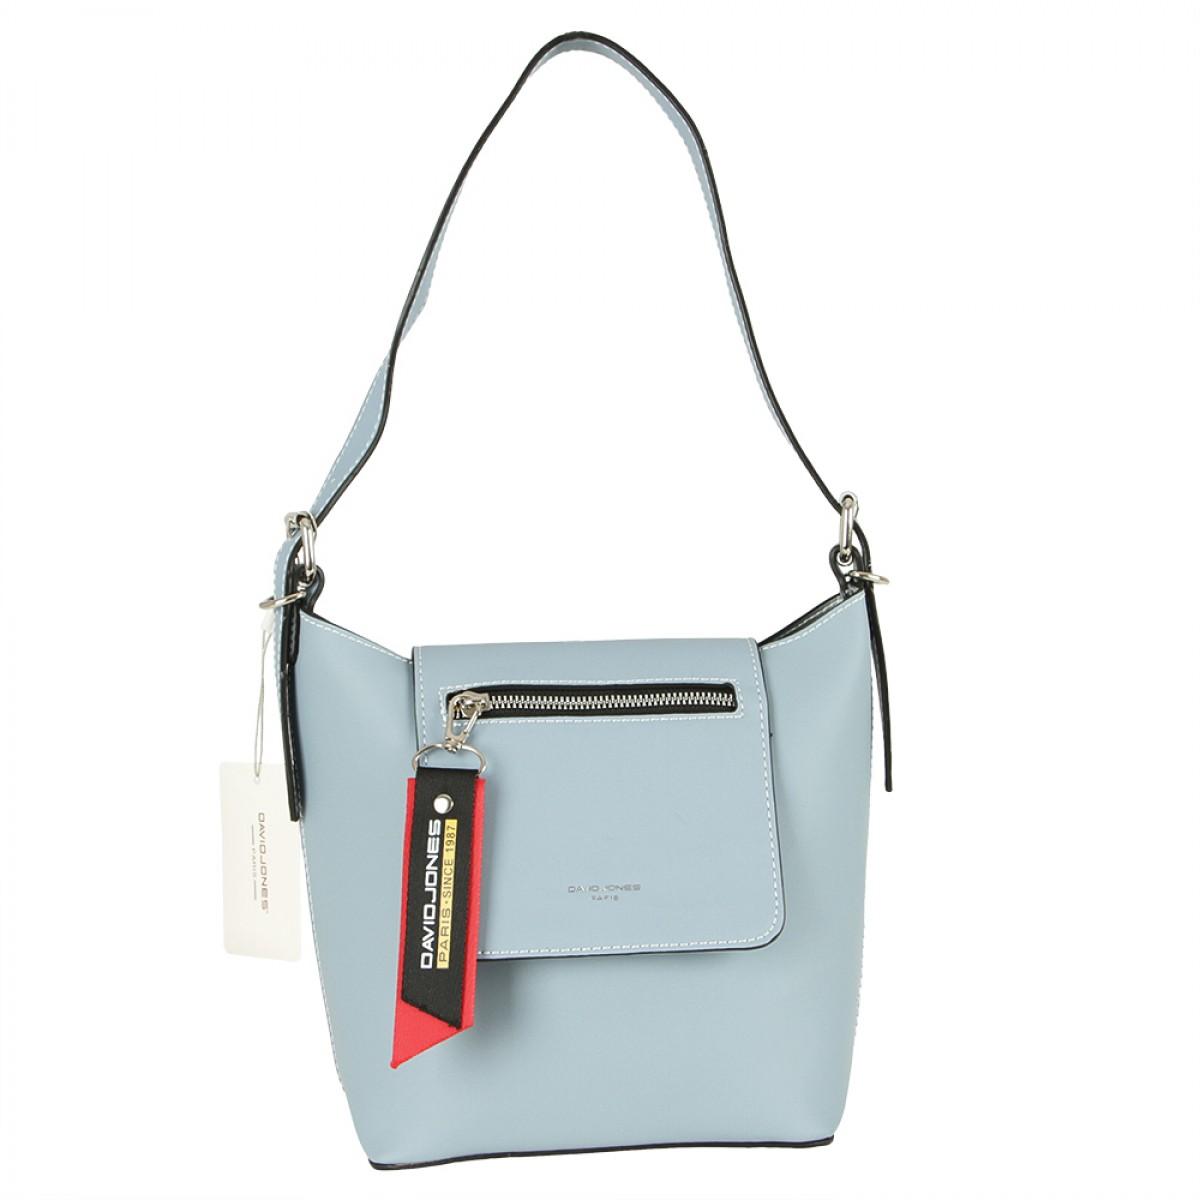 Жіноча сумка David Jones CM5600 PALE BLUE